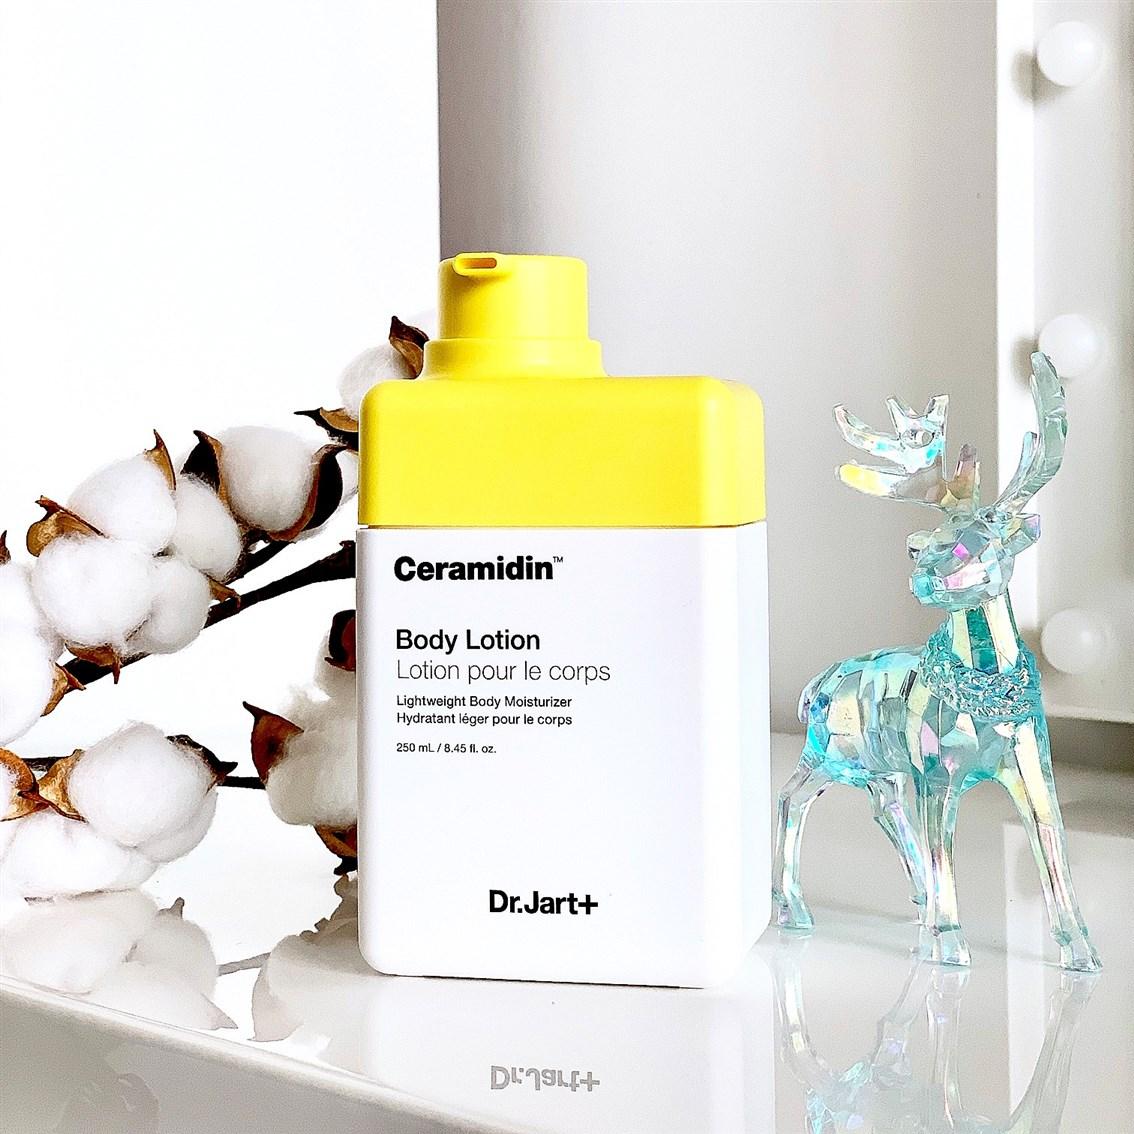 Dr. Jart+ Ceramidin balsam do ciała opinie